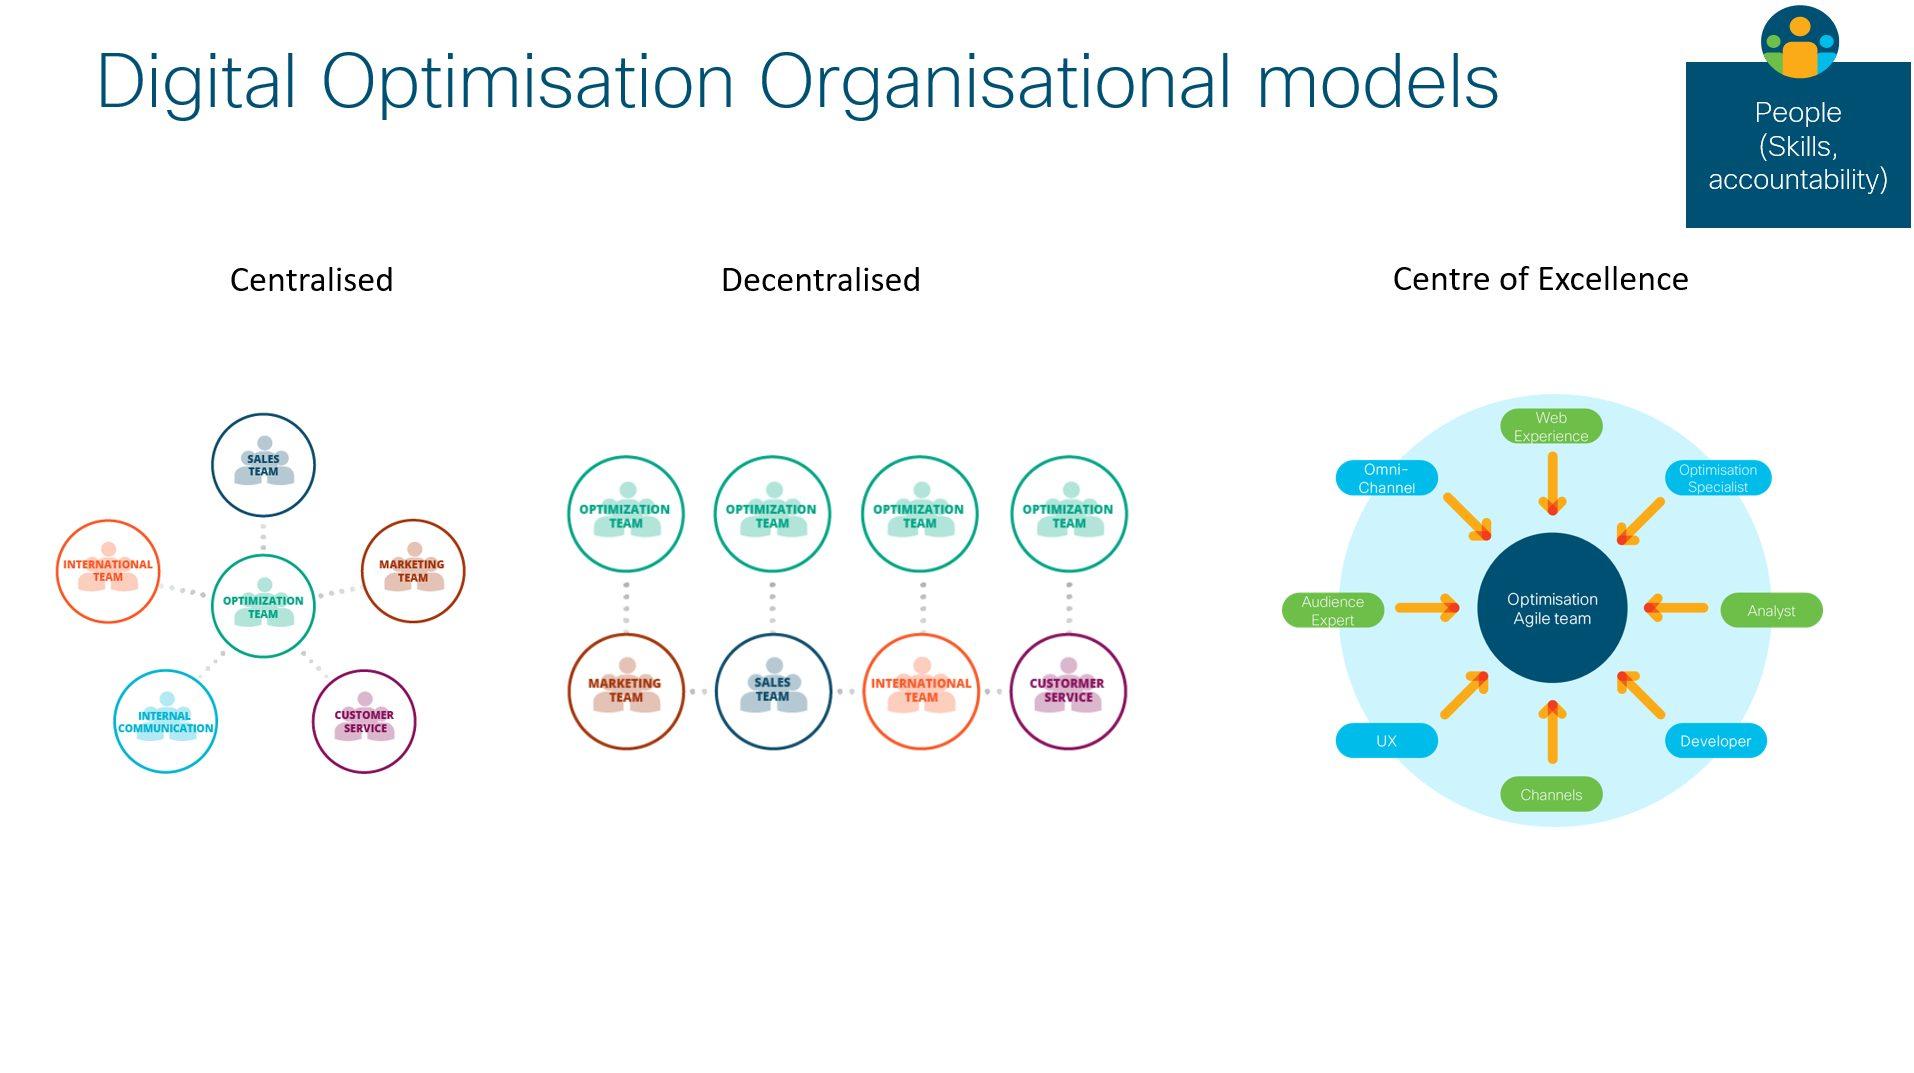 Cisco organizational models for optimization.